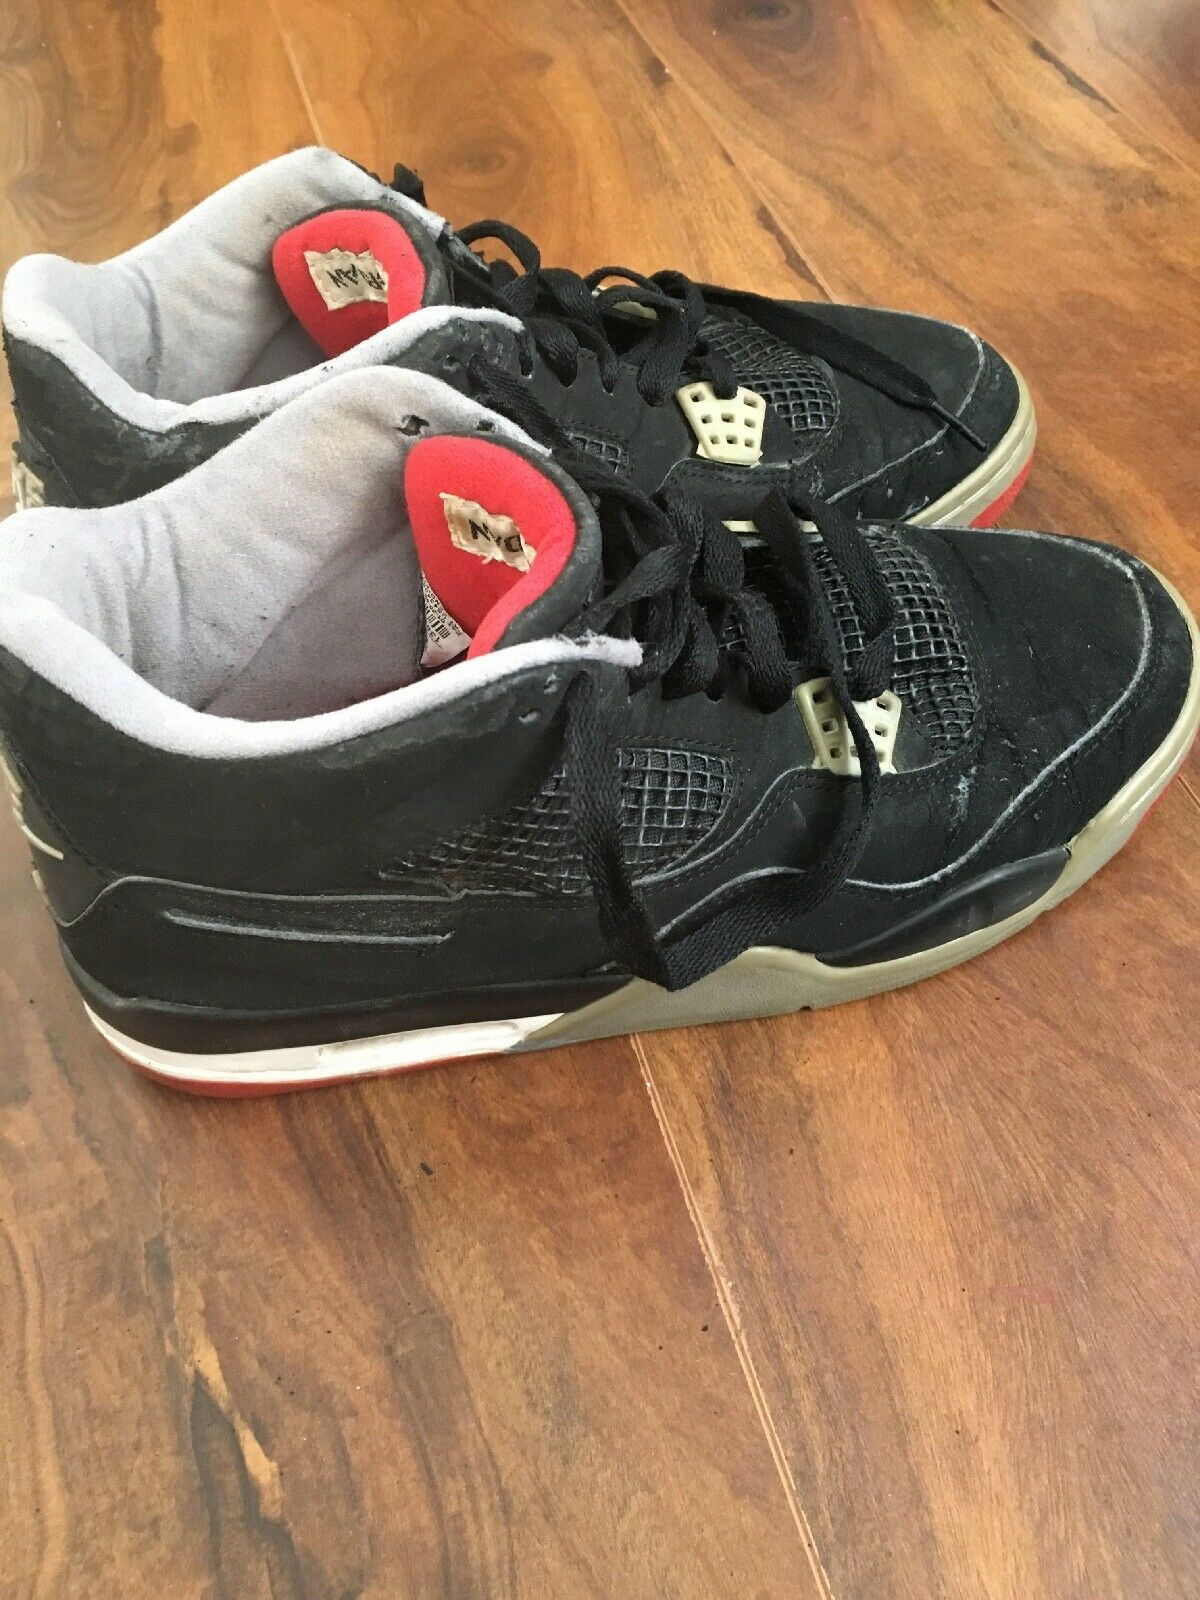 1999 Retro Nike Air Jordan Bred IV Black Red 4 Size 11